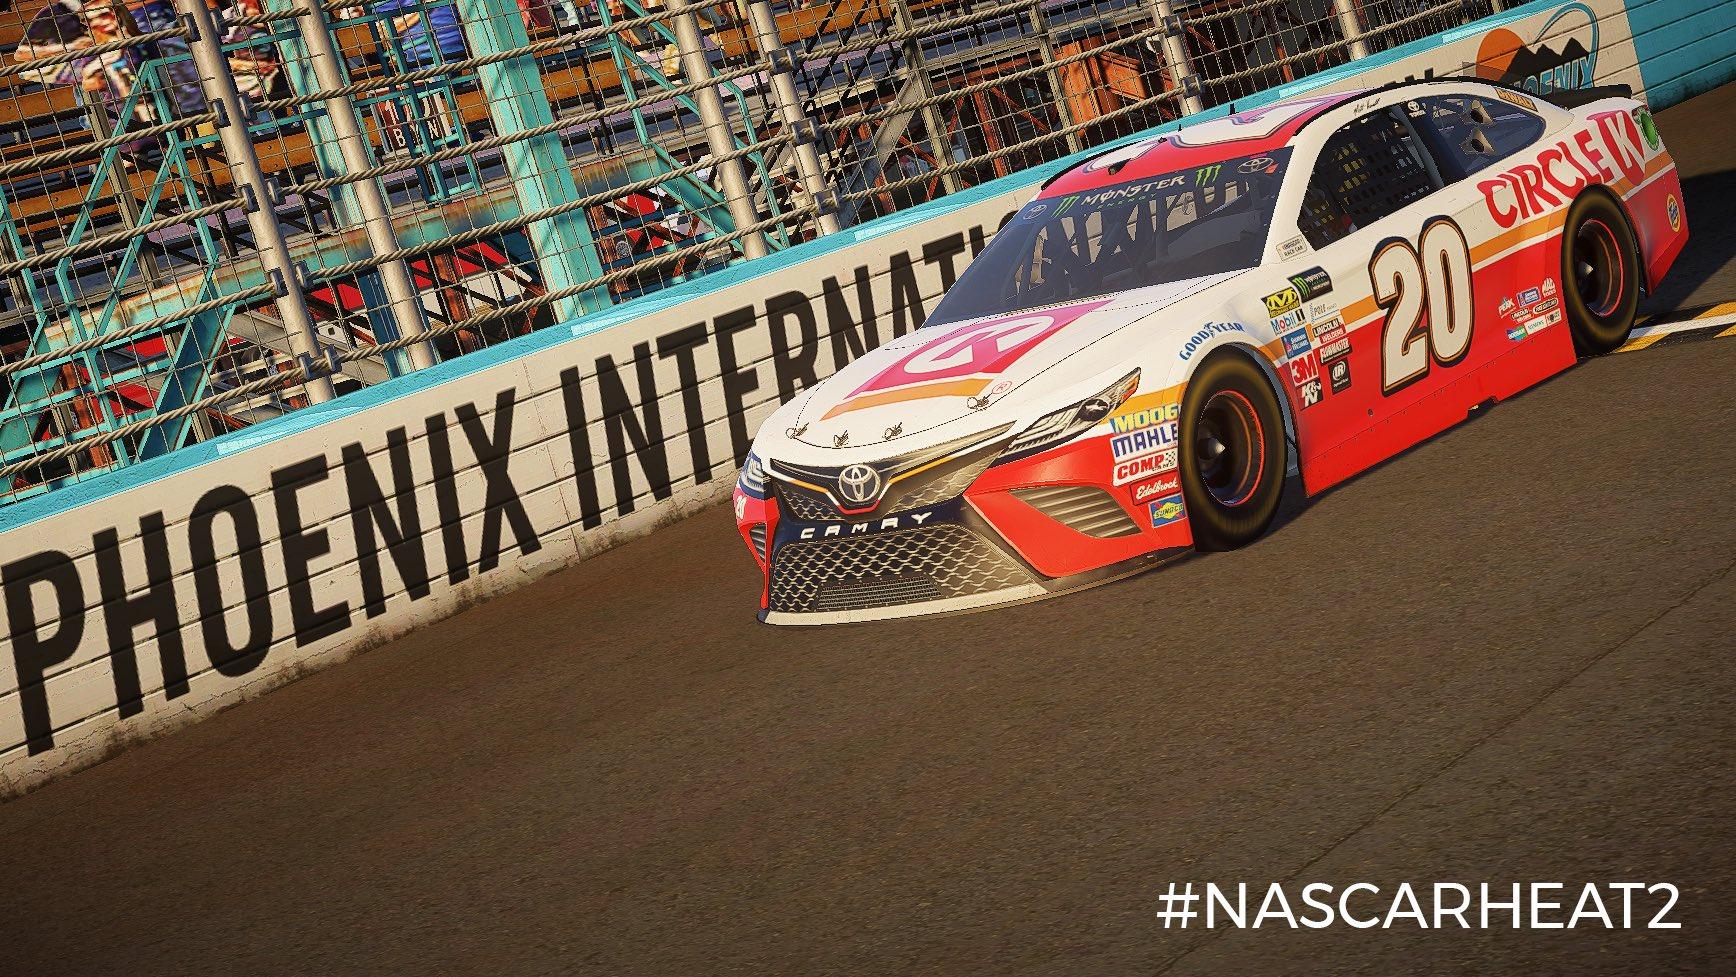 NASCAR HEAT 2 November DLC Details Revealed 2.jpg